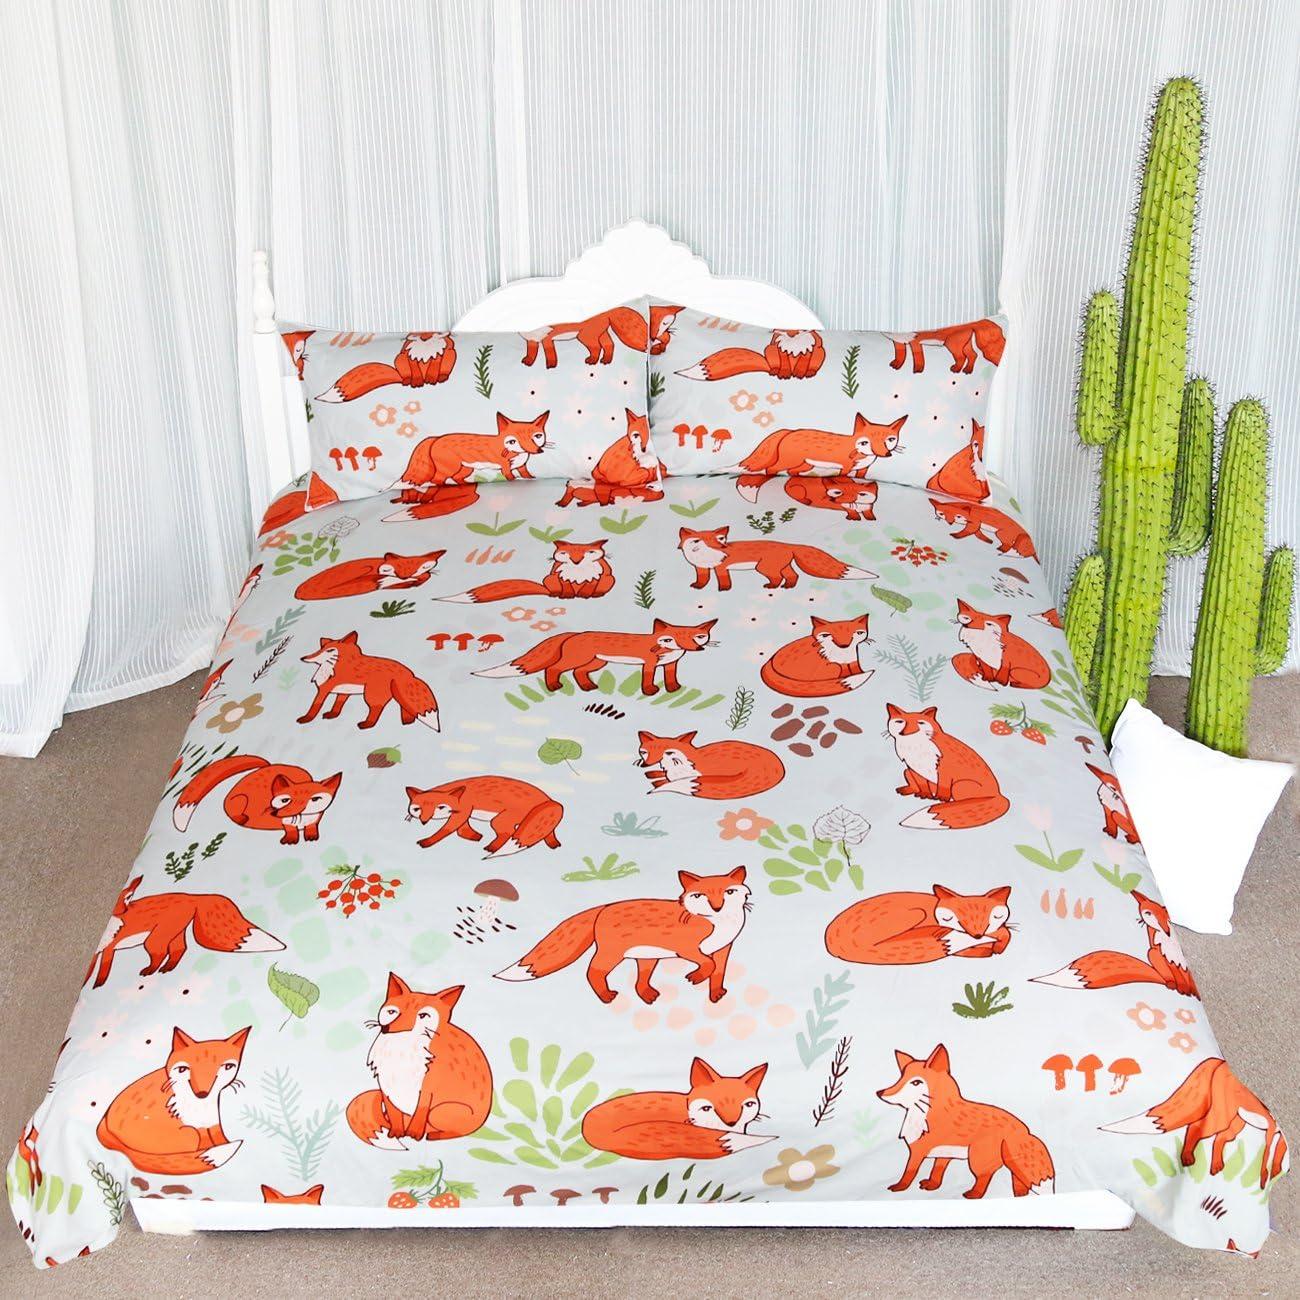 ARIGHTEX Woodland Fox Bedding Cartoon Forest Fruits Duvet Cover Romantic Orange Foxes Comforter Set Kids Nature Duvet Cover (Twin)